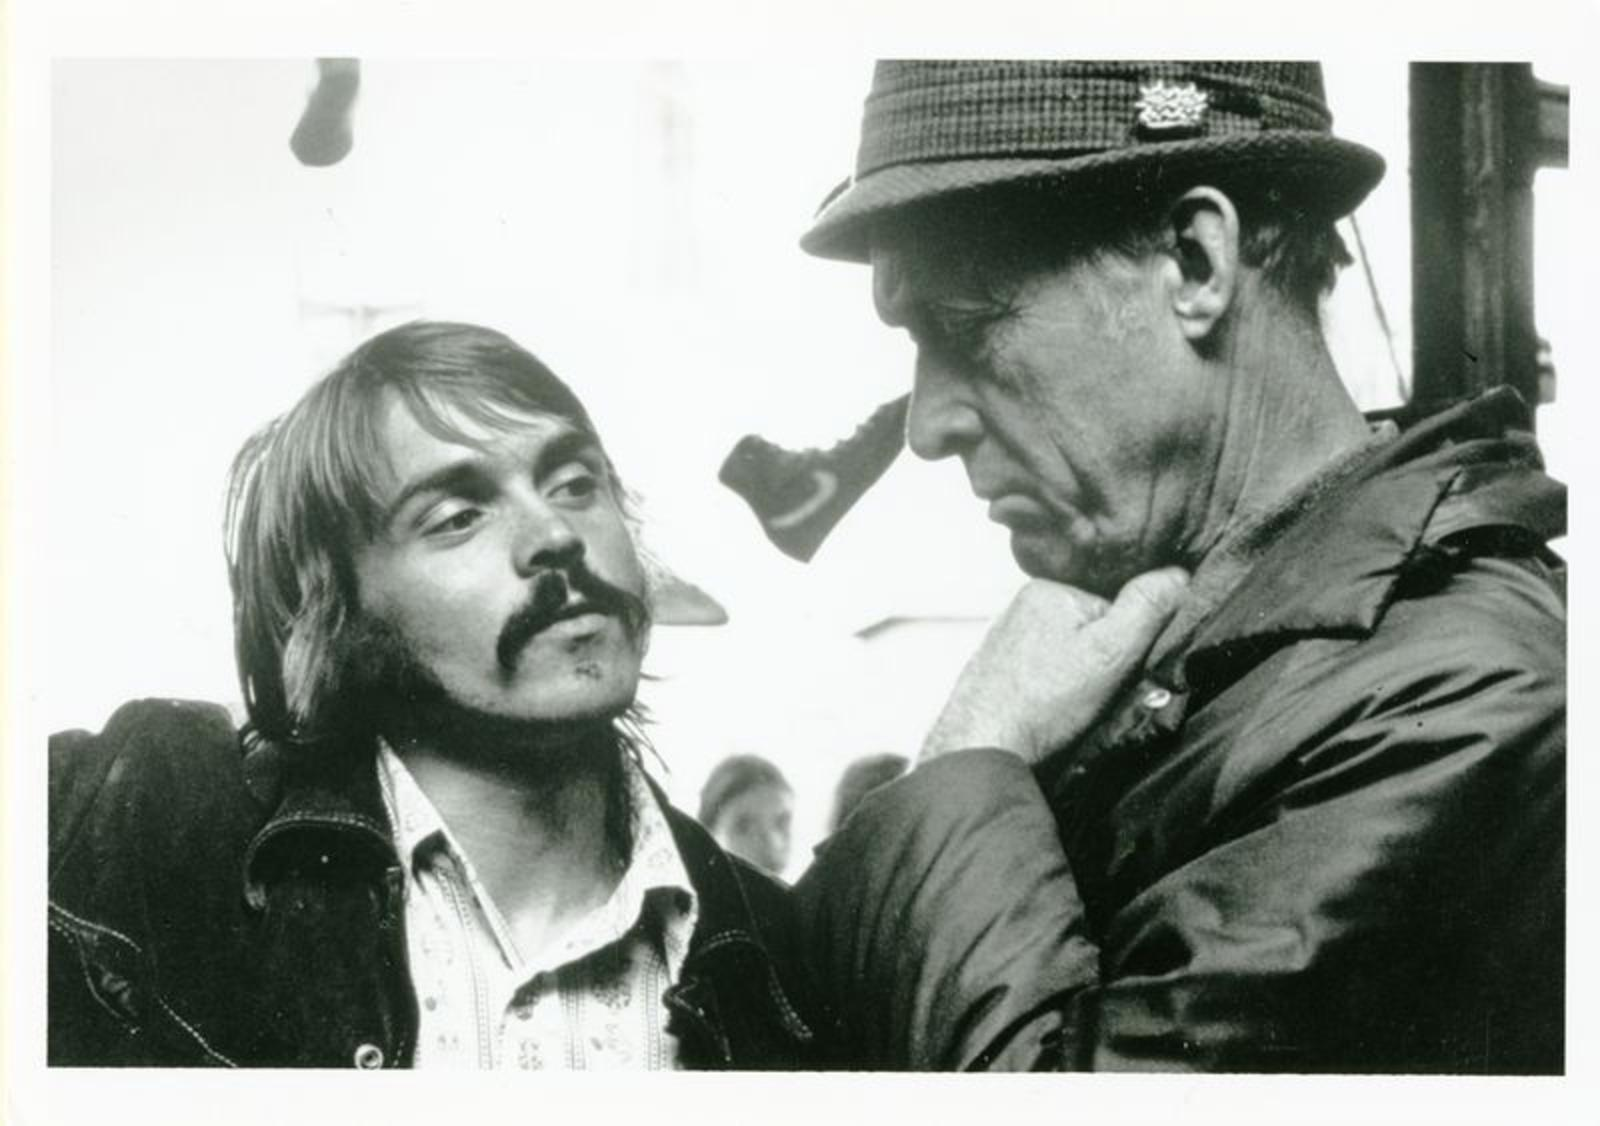 Steve Prefontaine i samtal med coach Bill Bowerman. Och en #lunarepic sko i bakgrunden?!?